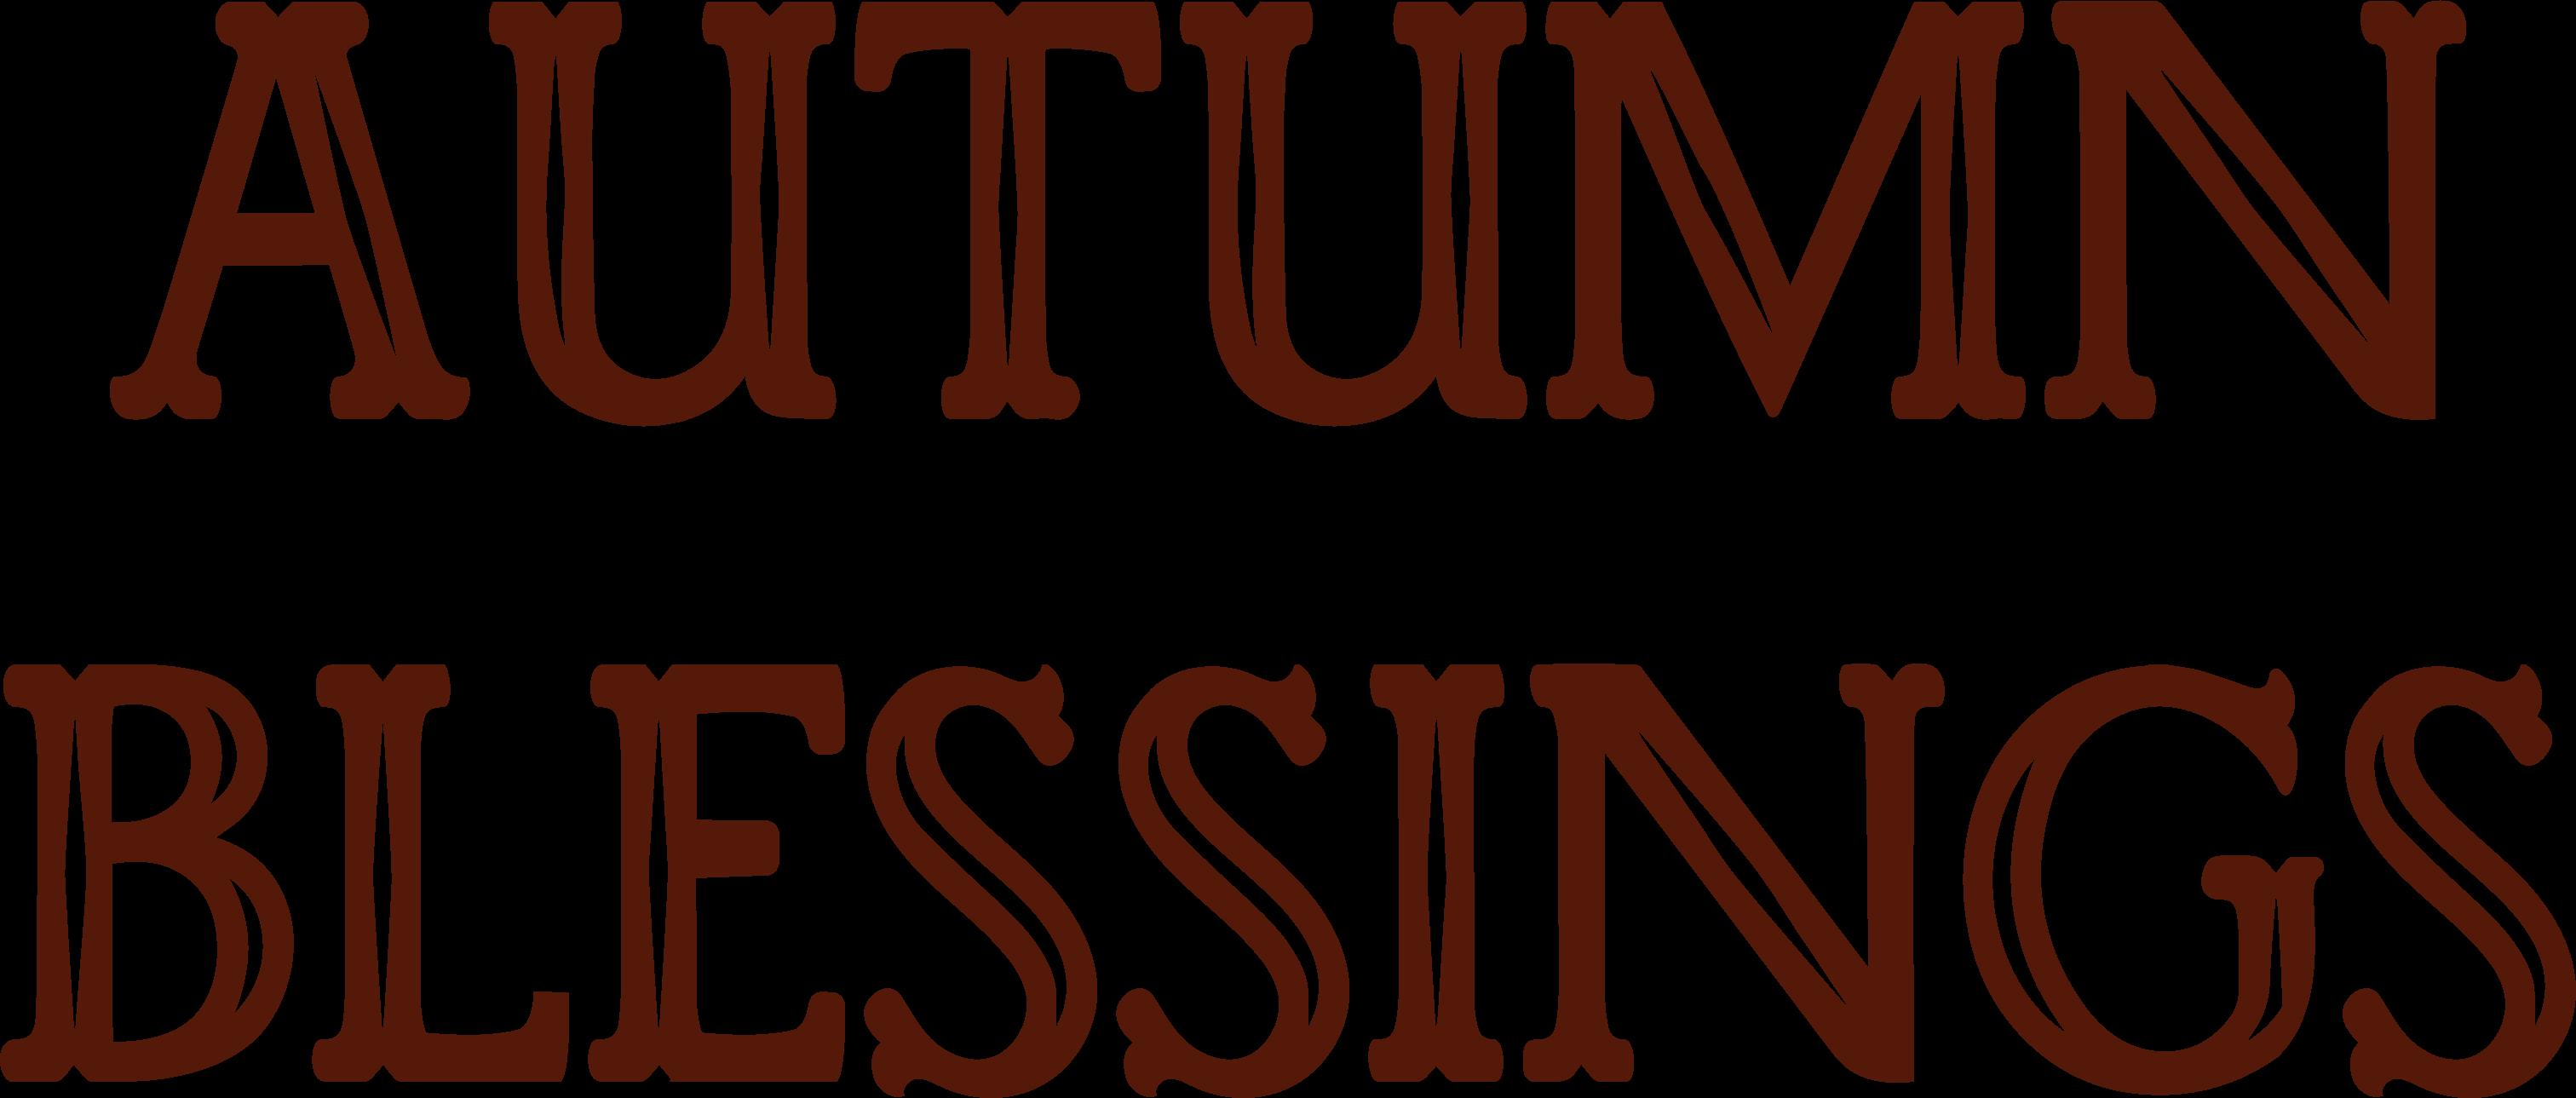 Autumn Blessings #2 SVG Cut File